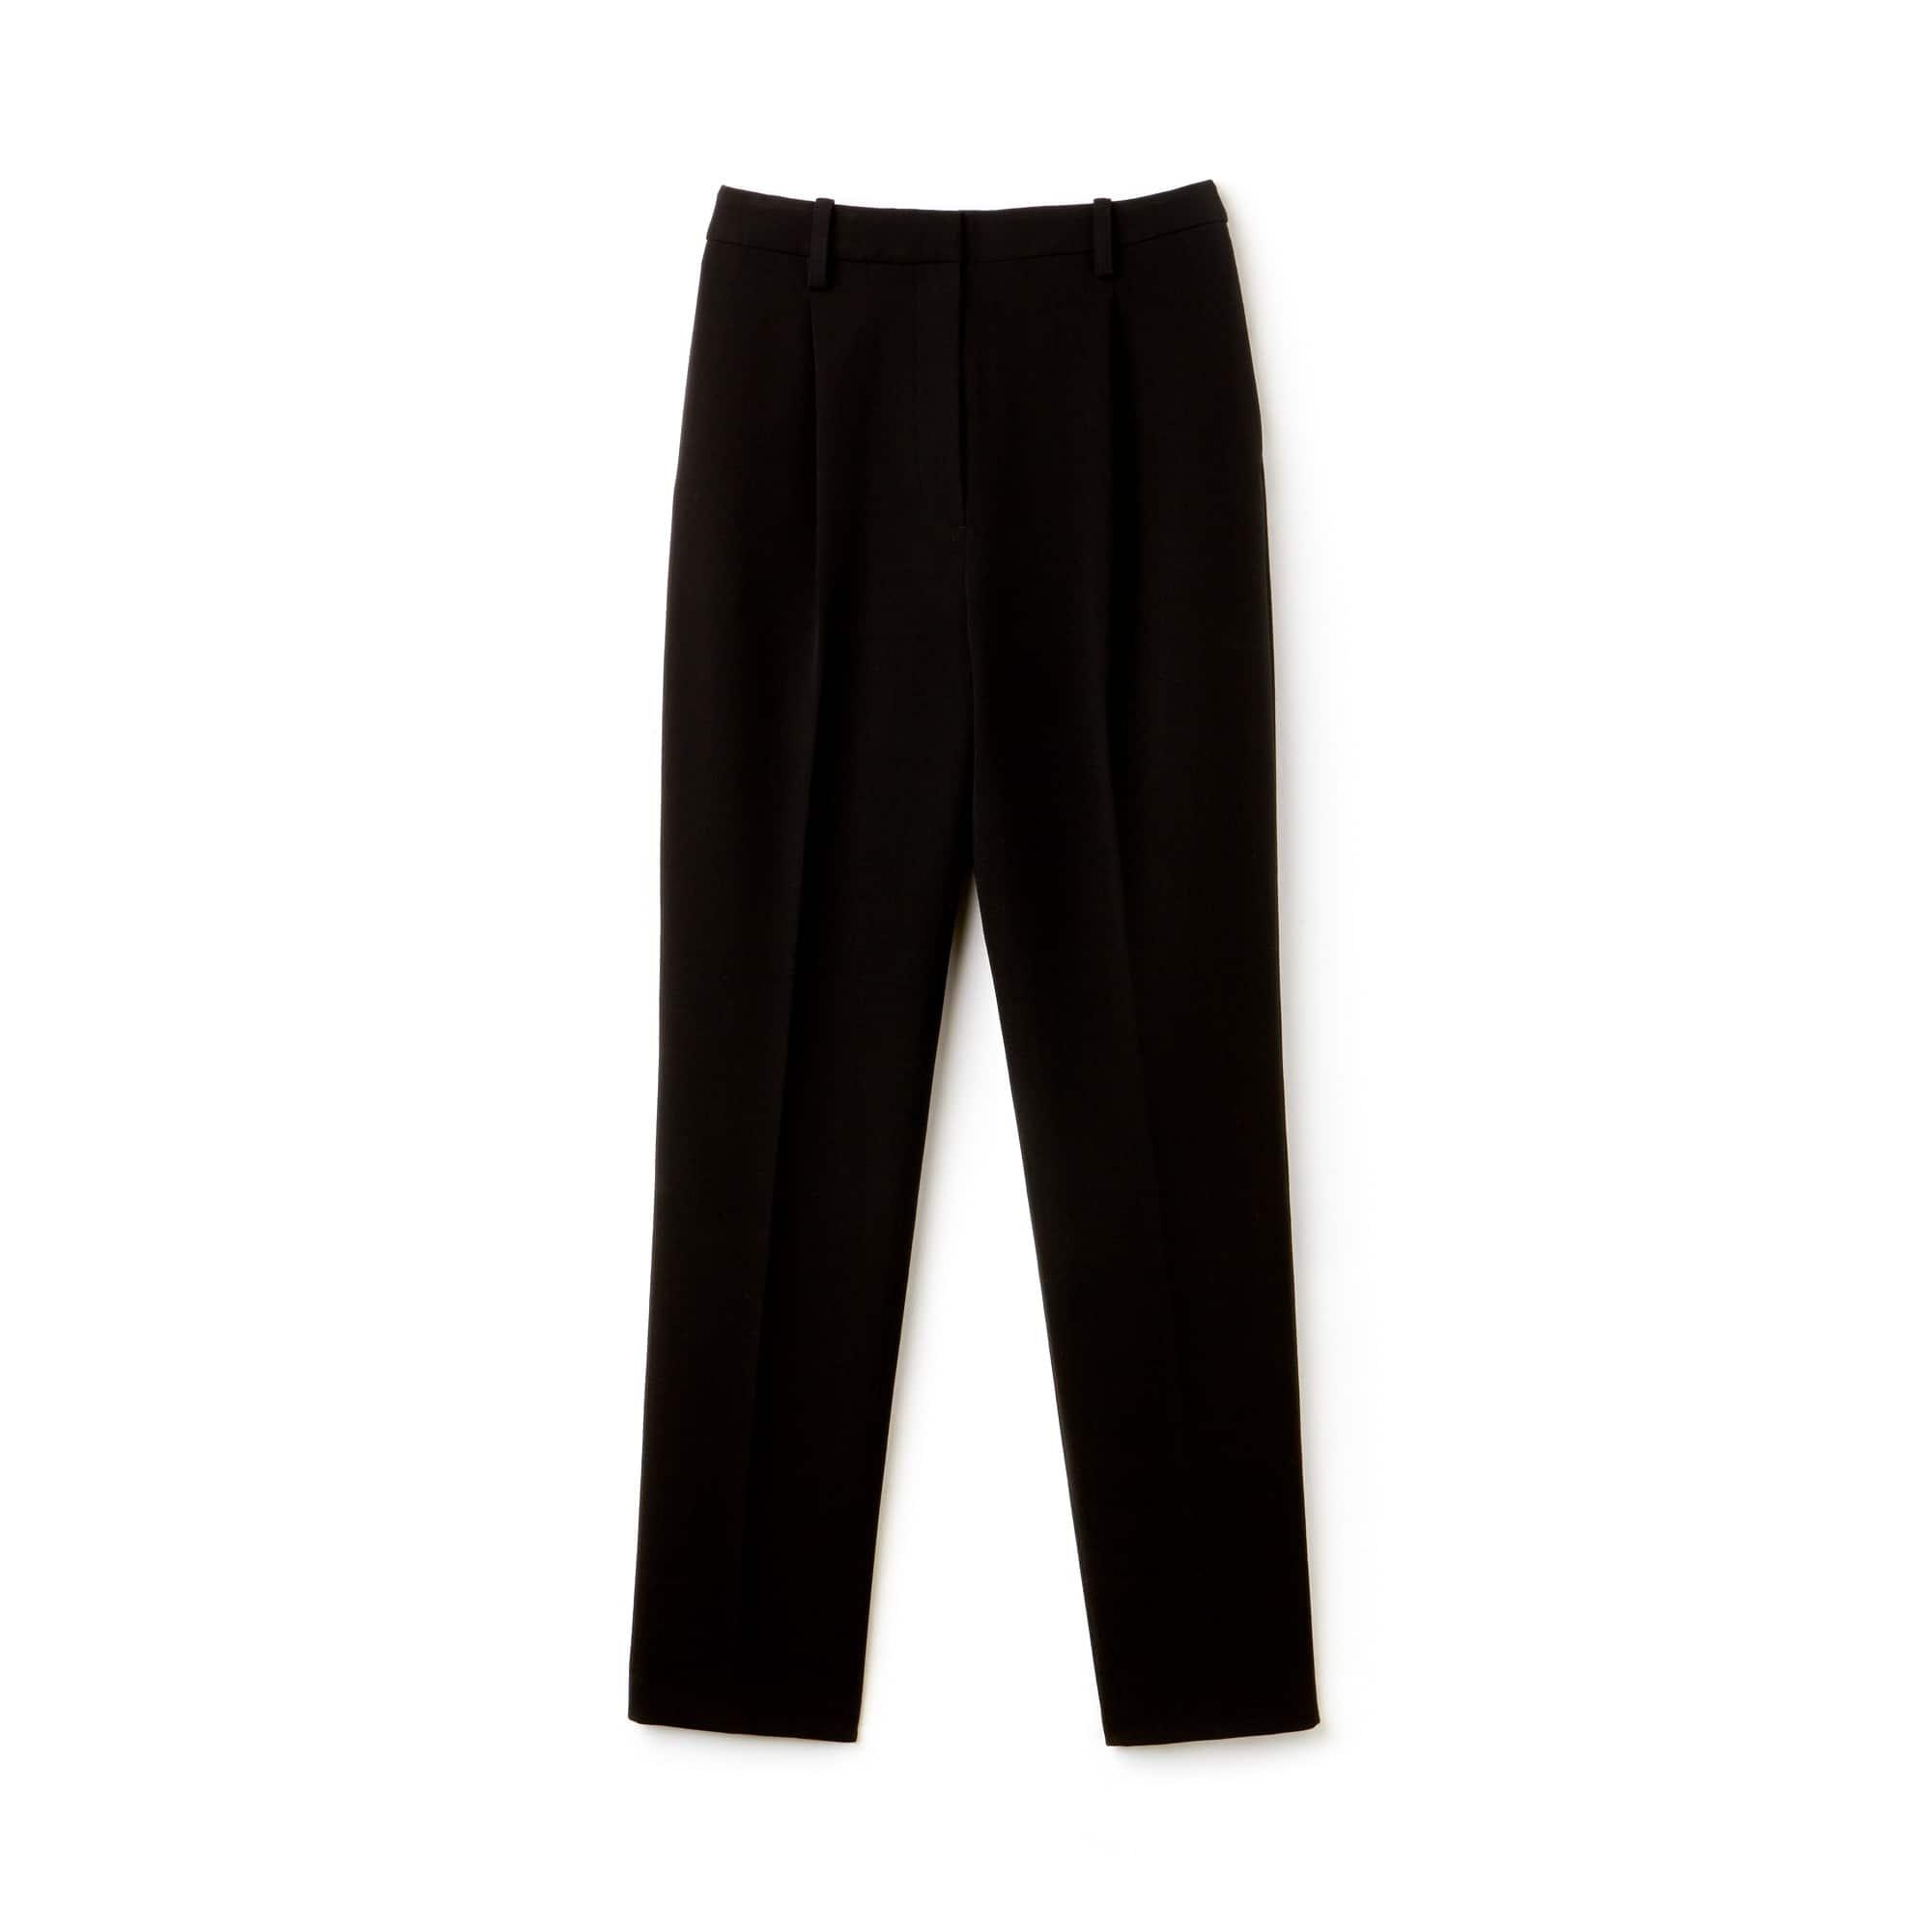 Pantaloni slim fit a carota con pince in gabardine di cotone stretch